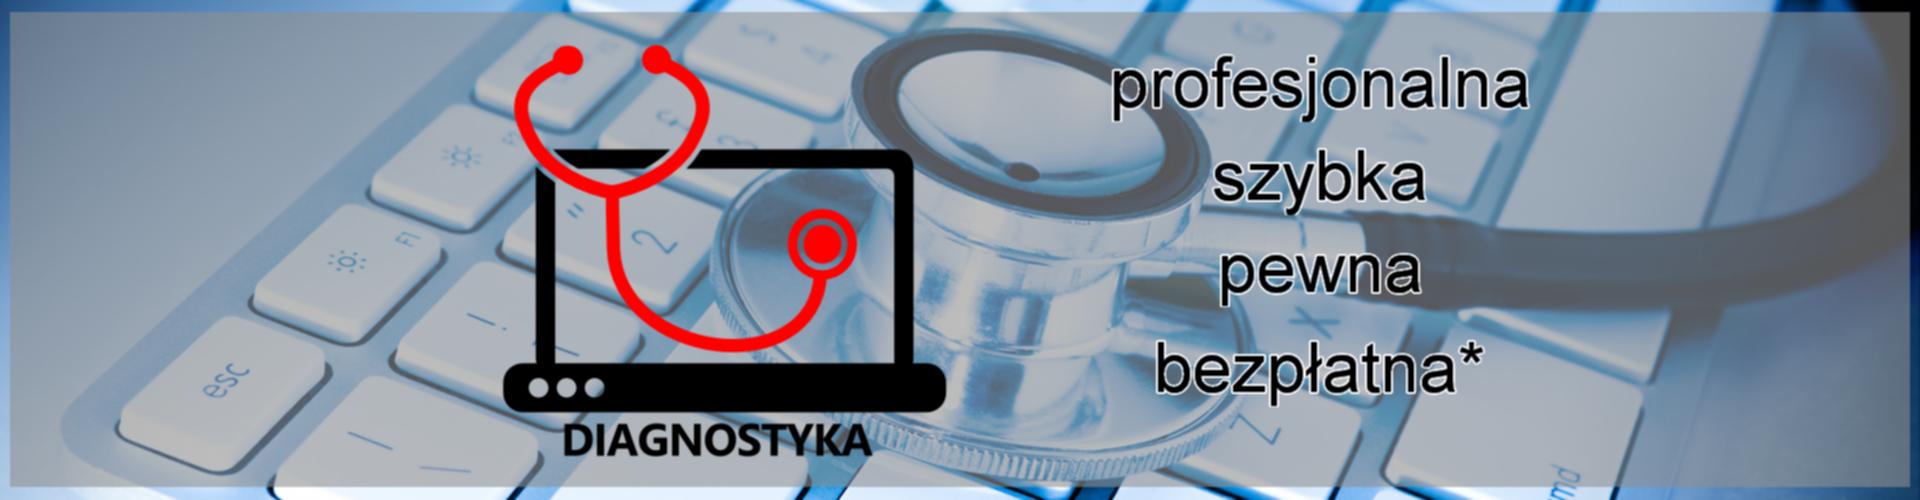 Diagnoza - profesjonalna, szybka, pewna, bezpłatna